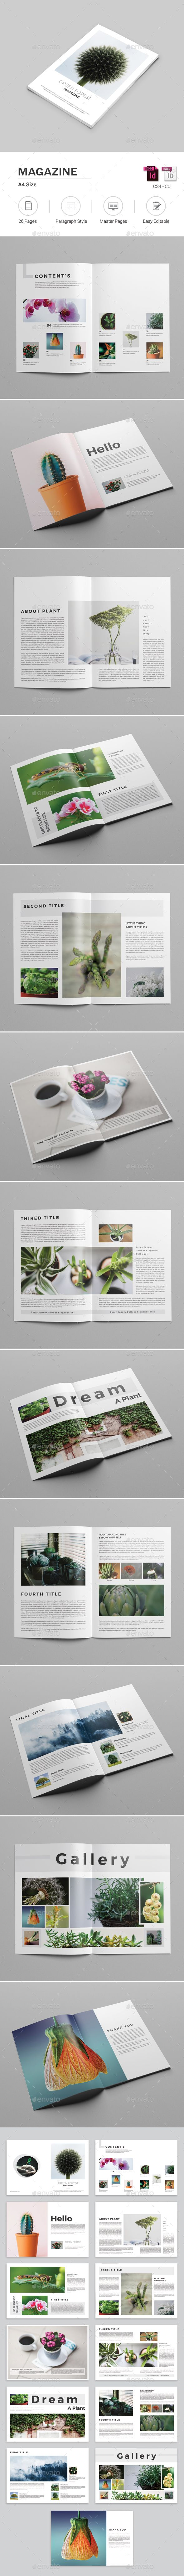 Magazine - Magazines Print Templates Download here : https://graphicriver.net/item/magazine/18599072?s_rank=70&ref=Al-fatih